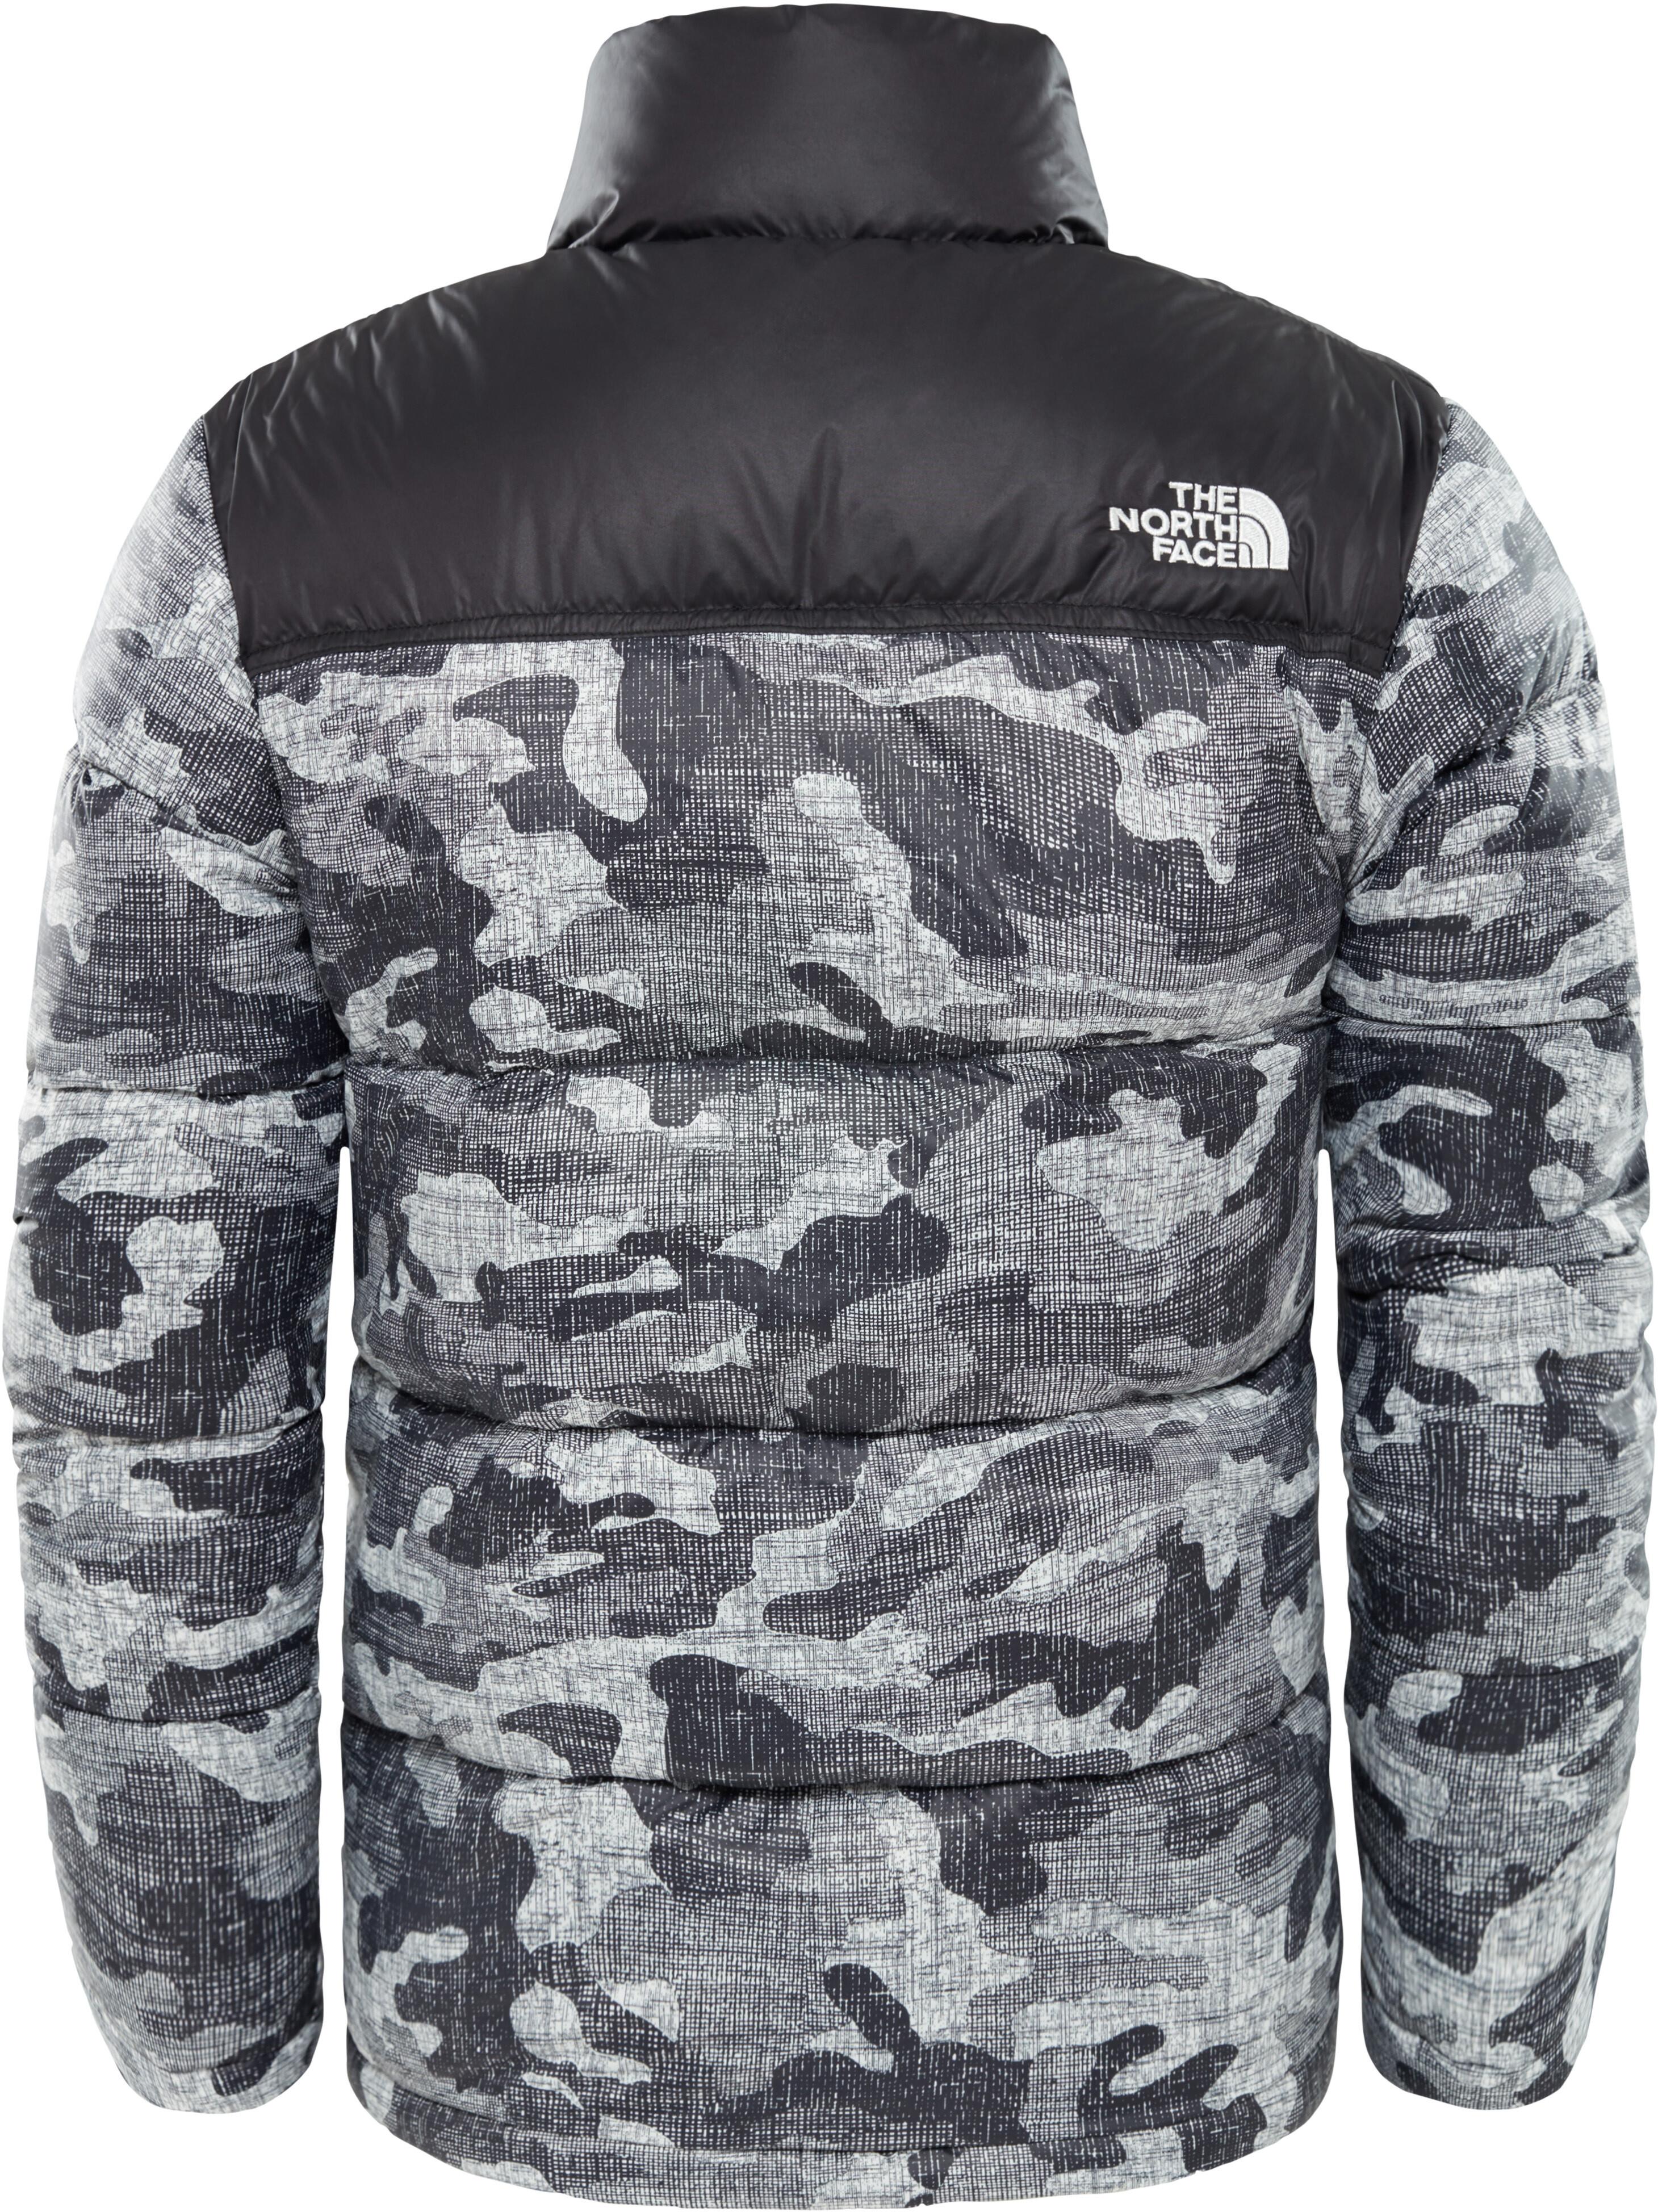 8da17ab222 The North Face Nuptse Jacket Children grey black at Addnature.co.uk